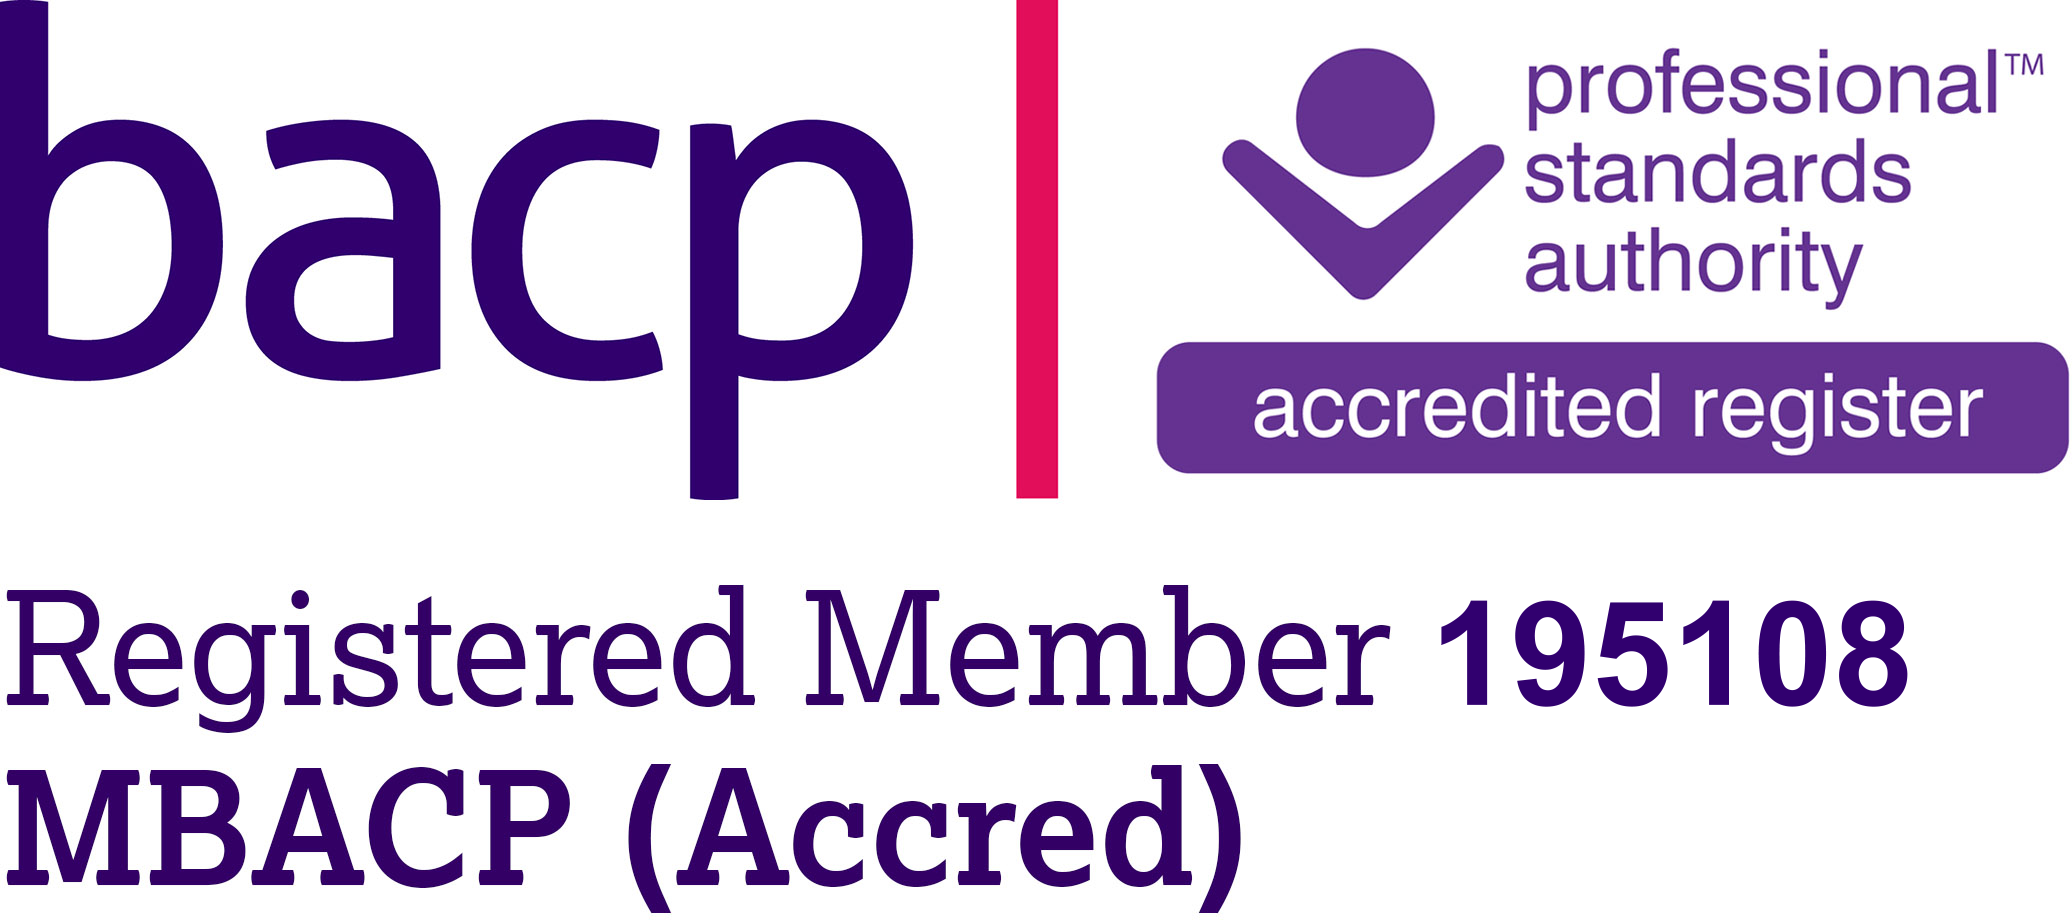 BACP Logo 2019 Accred - 195108